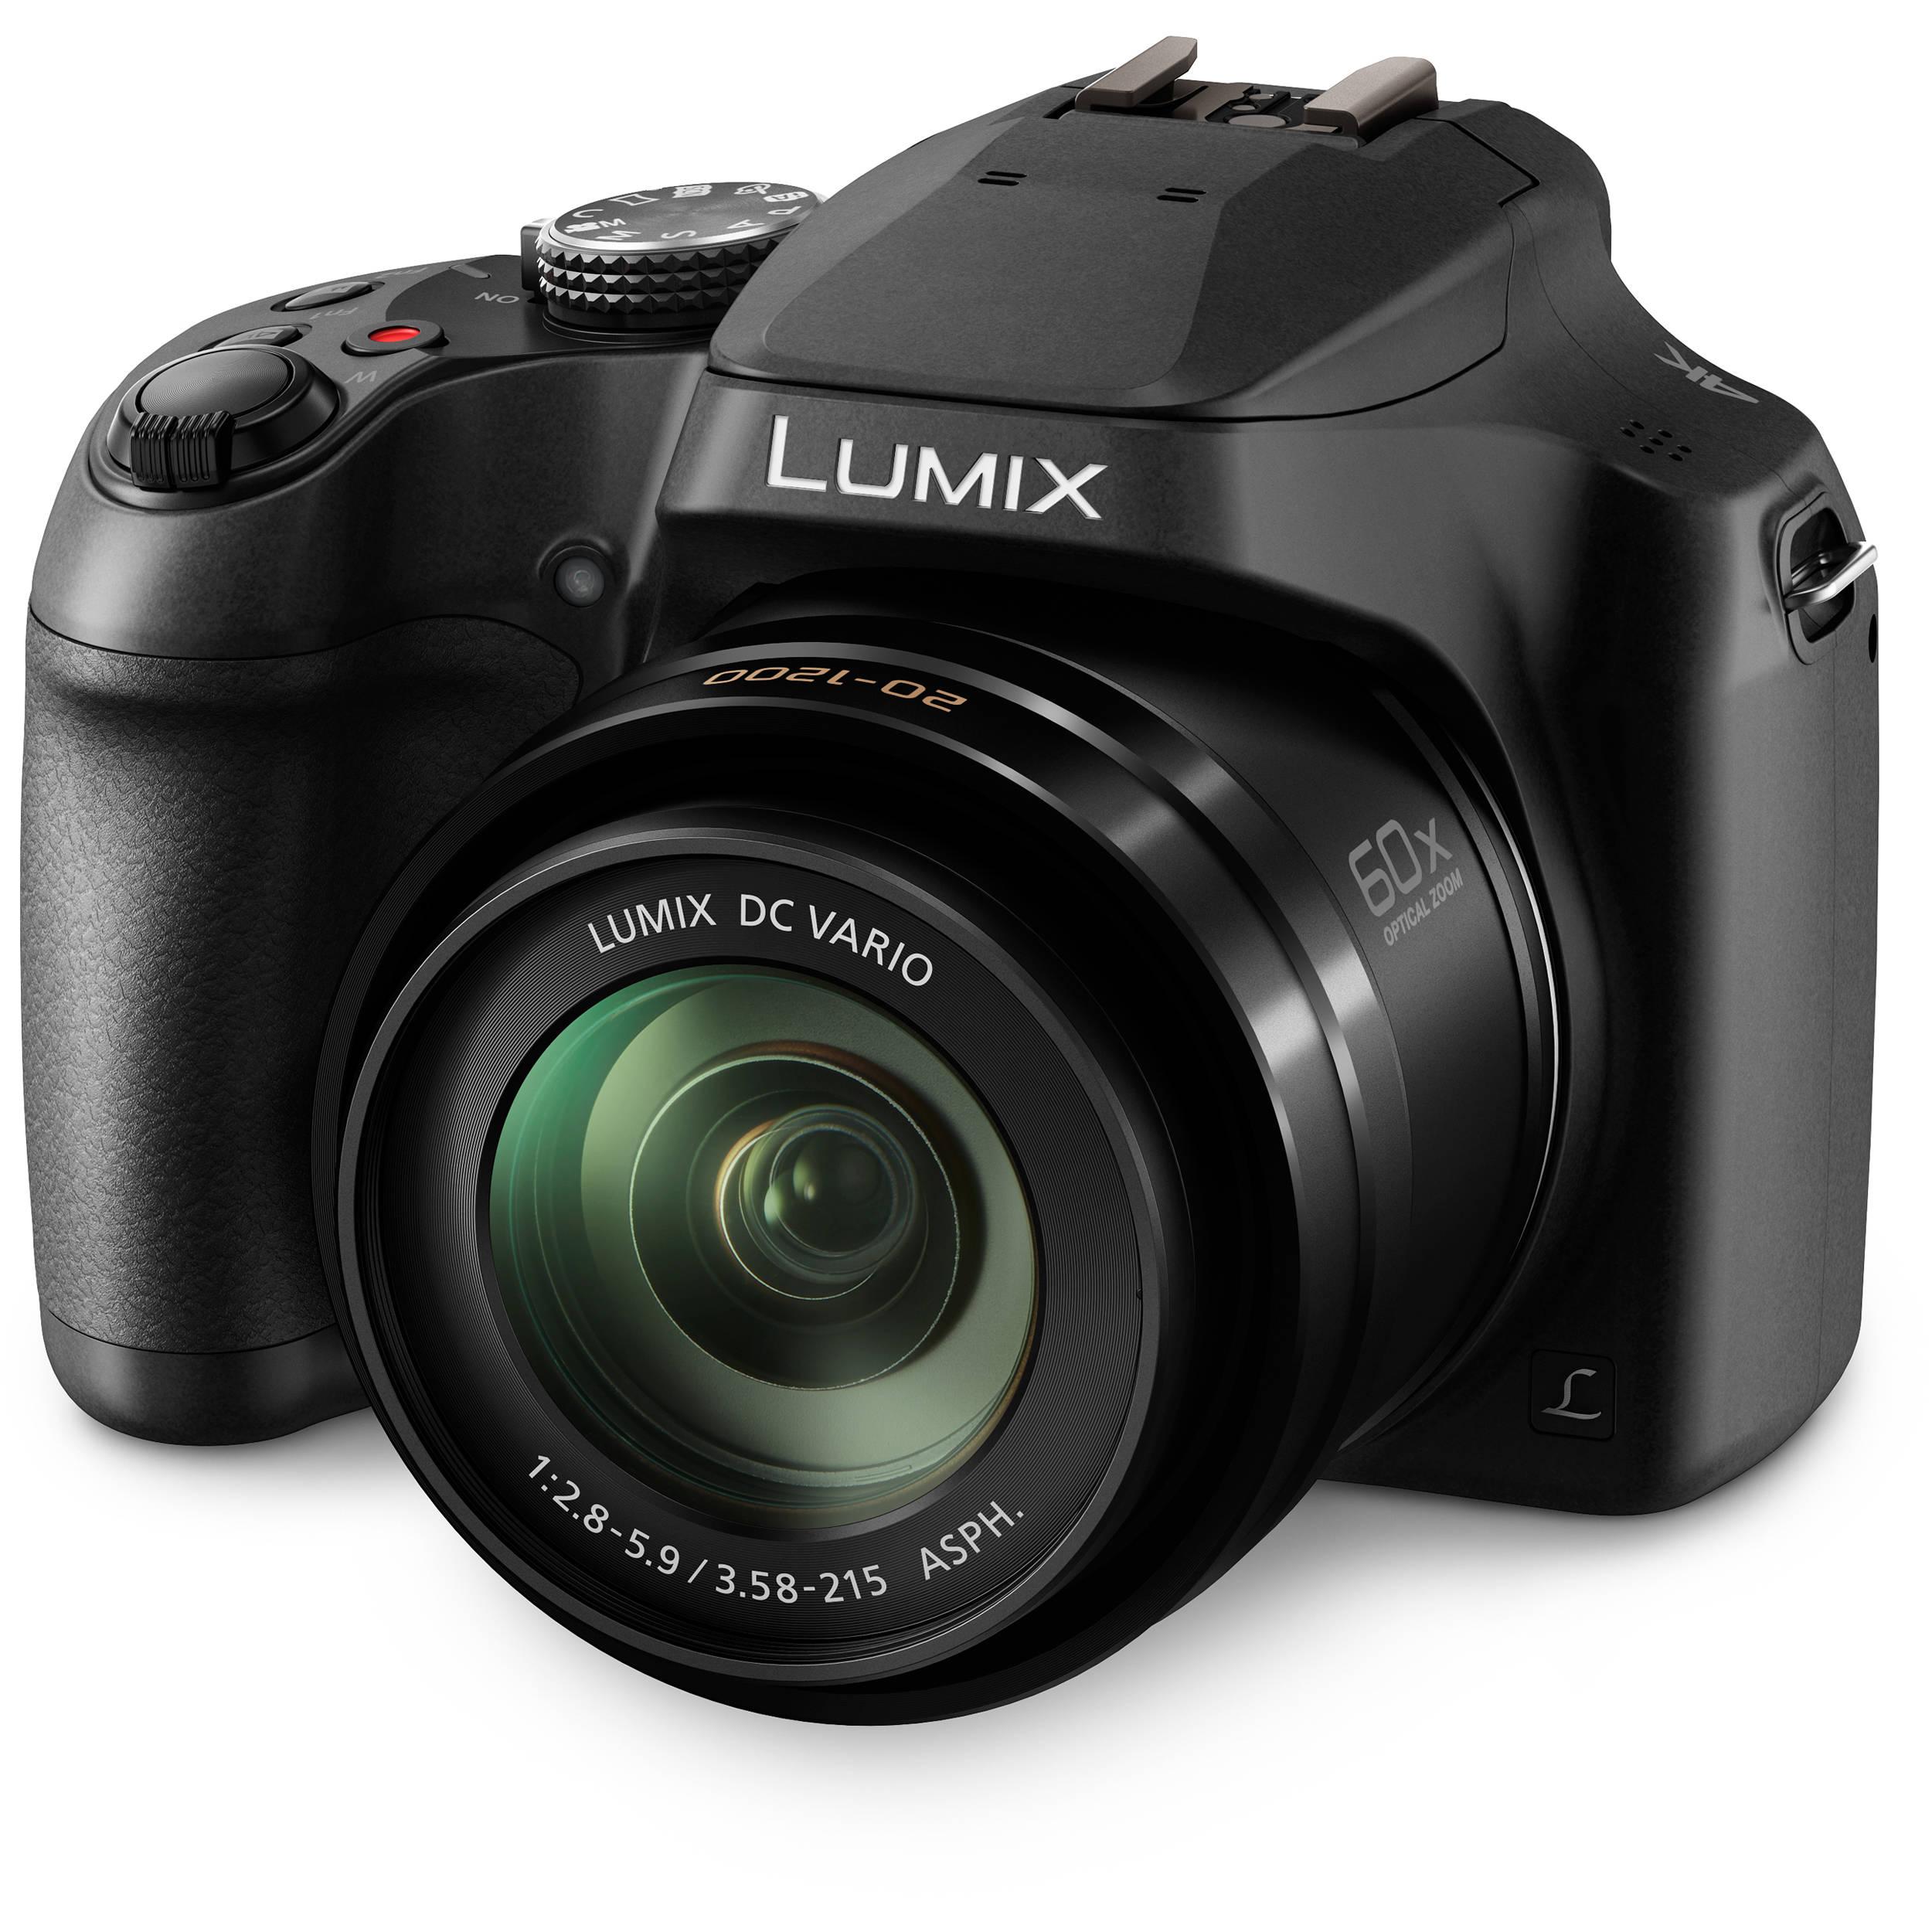 Panasonic Lumix DC-FZ80 - Cameras, DSLR Cameras, Panasonic - Buy ...